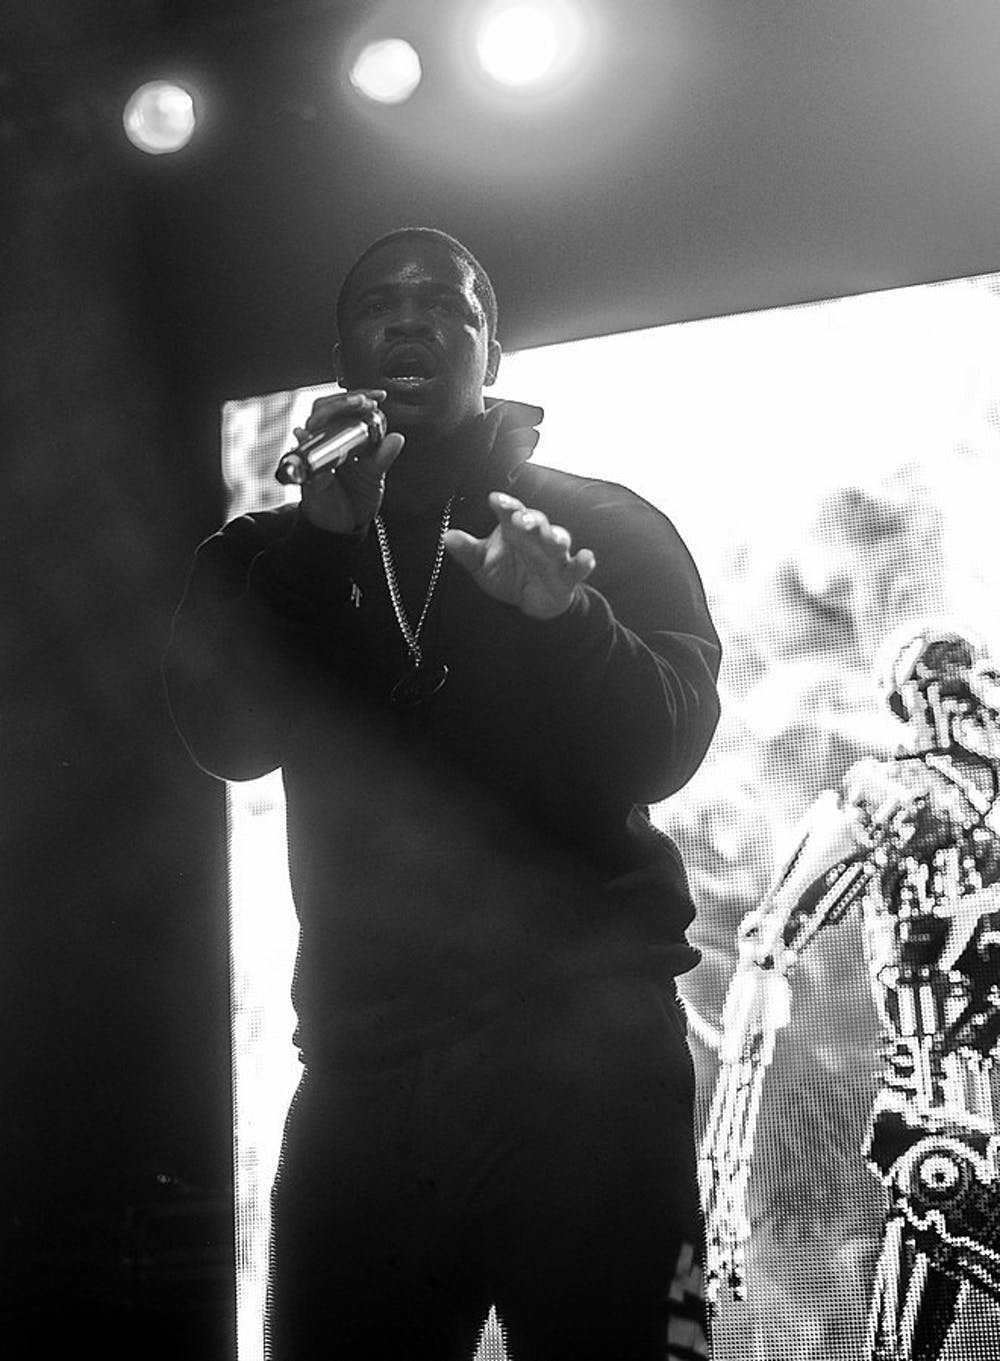 A$AP Ferg to play SUB x WVAU Welcome Week show